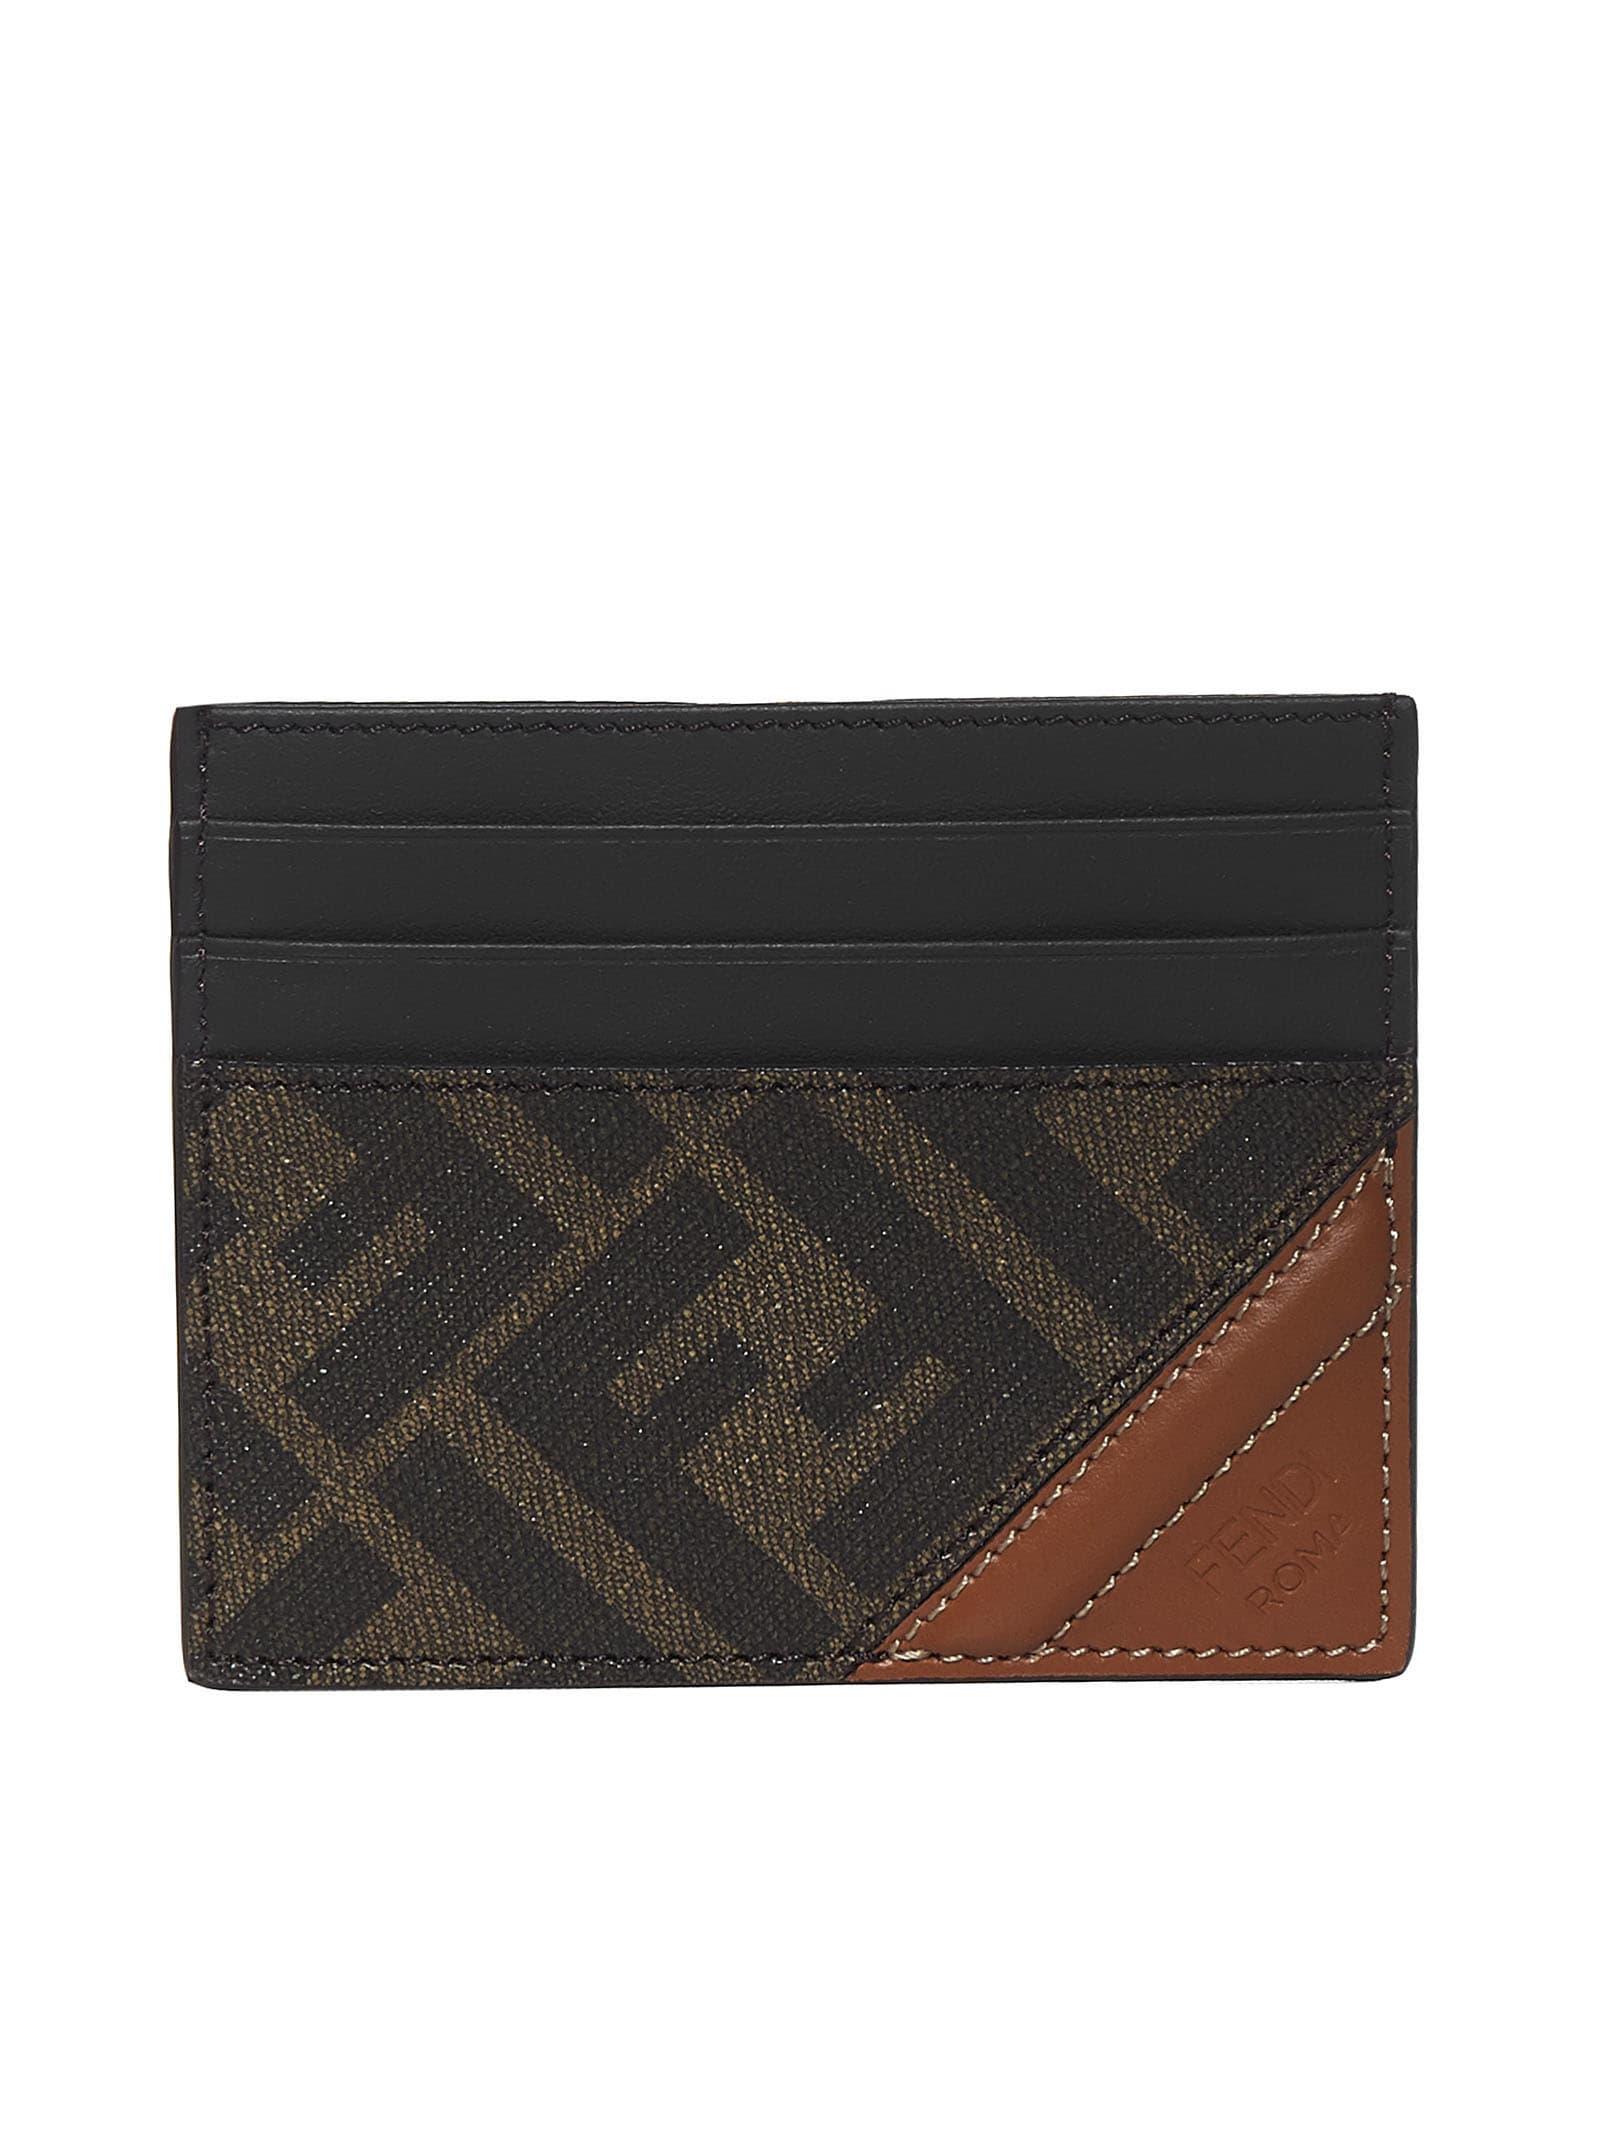 Fendi Wallet In Tab.mr+cuoio+pall